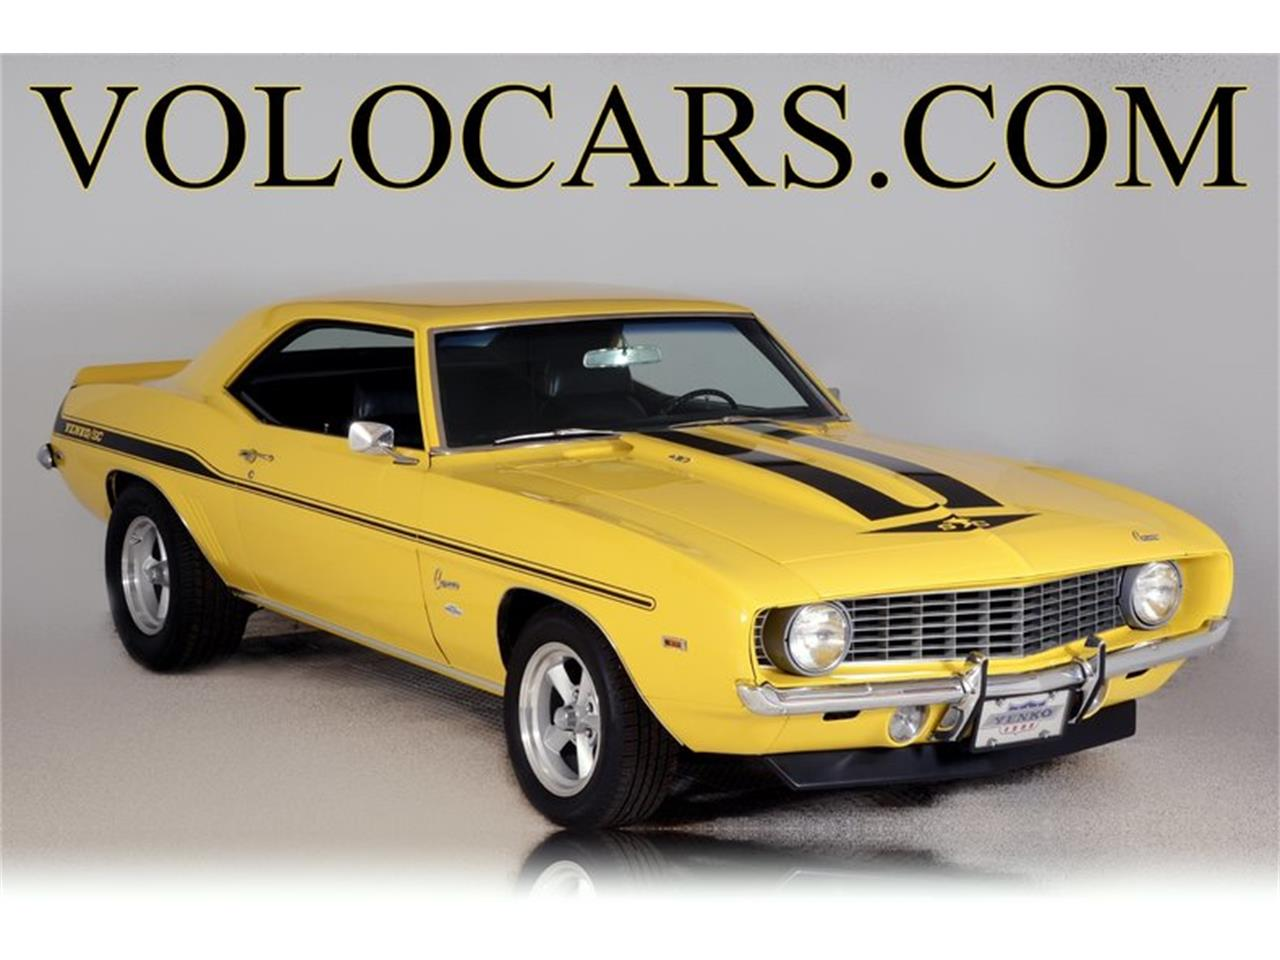 Yenko Camaro For Sale >> 1969 Chevrolet Camaro Yenko Tribute For Sale Classiccars Com Cc